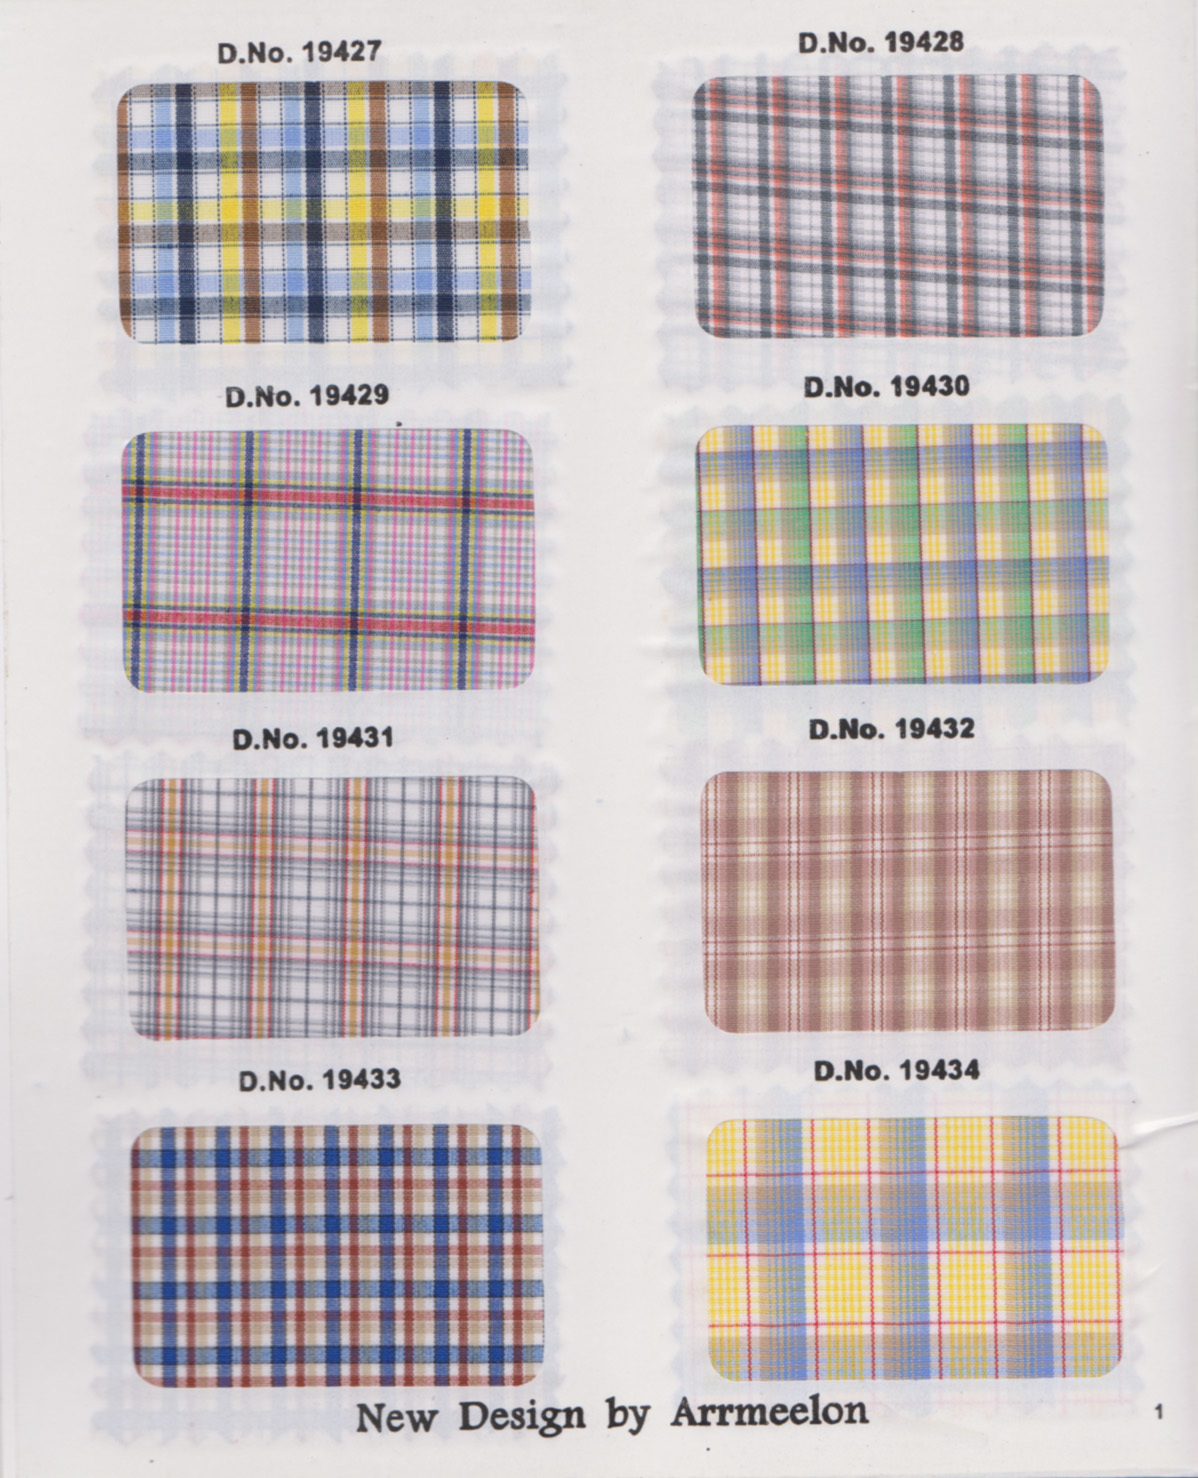 Arrmeelon Exclusive Shirtings Fabric